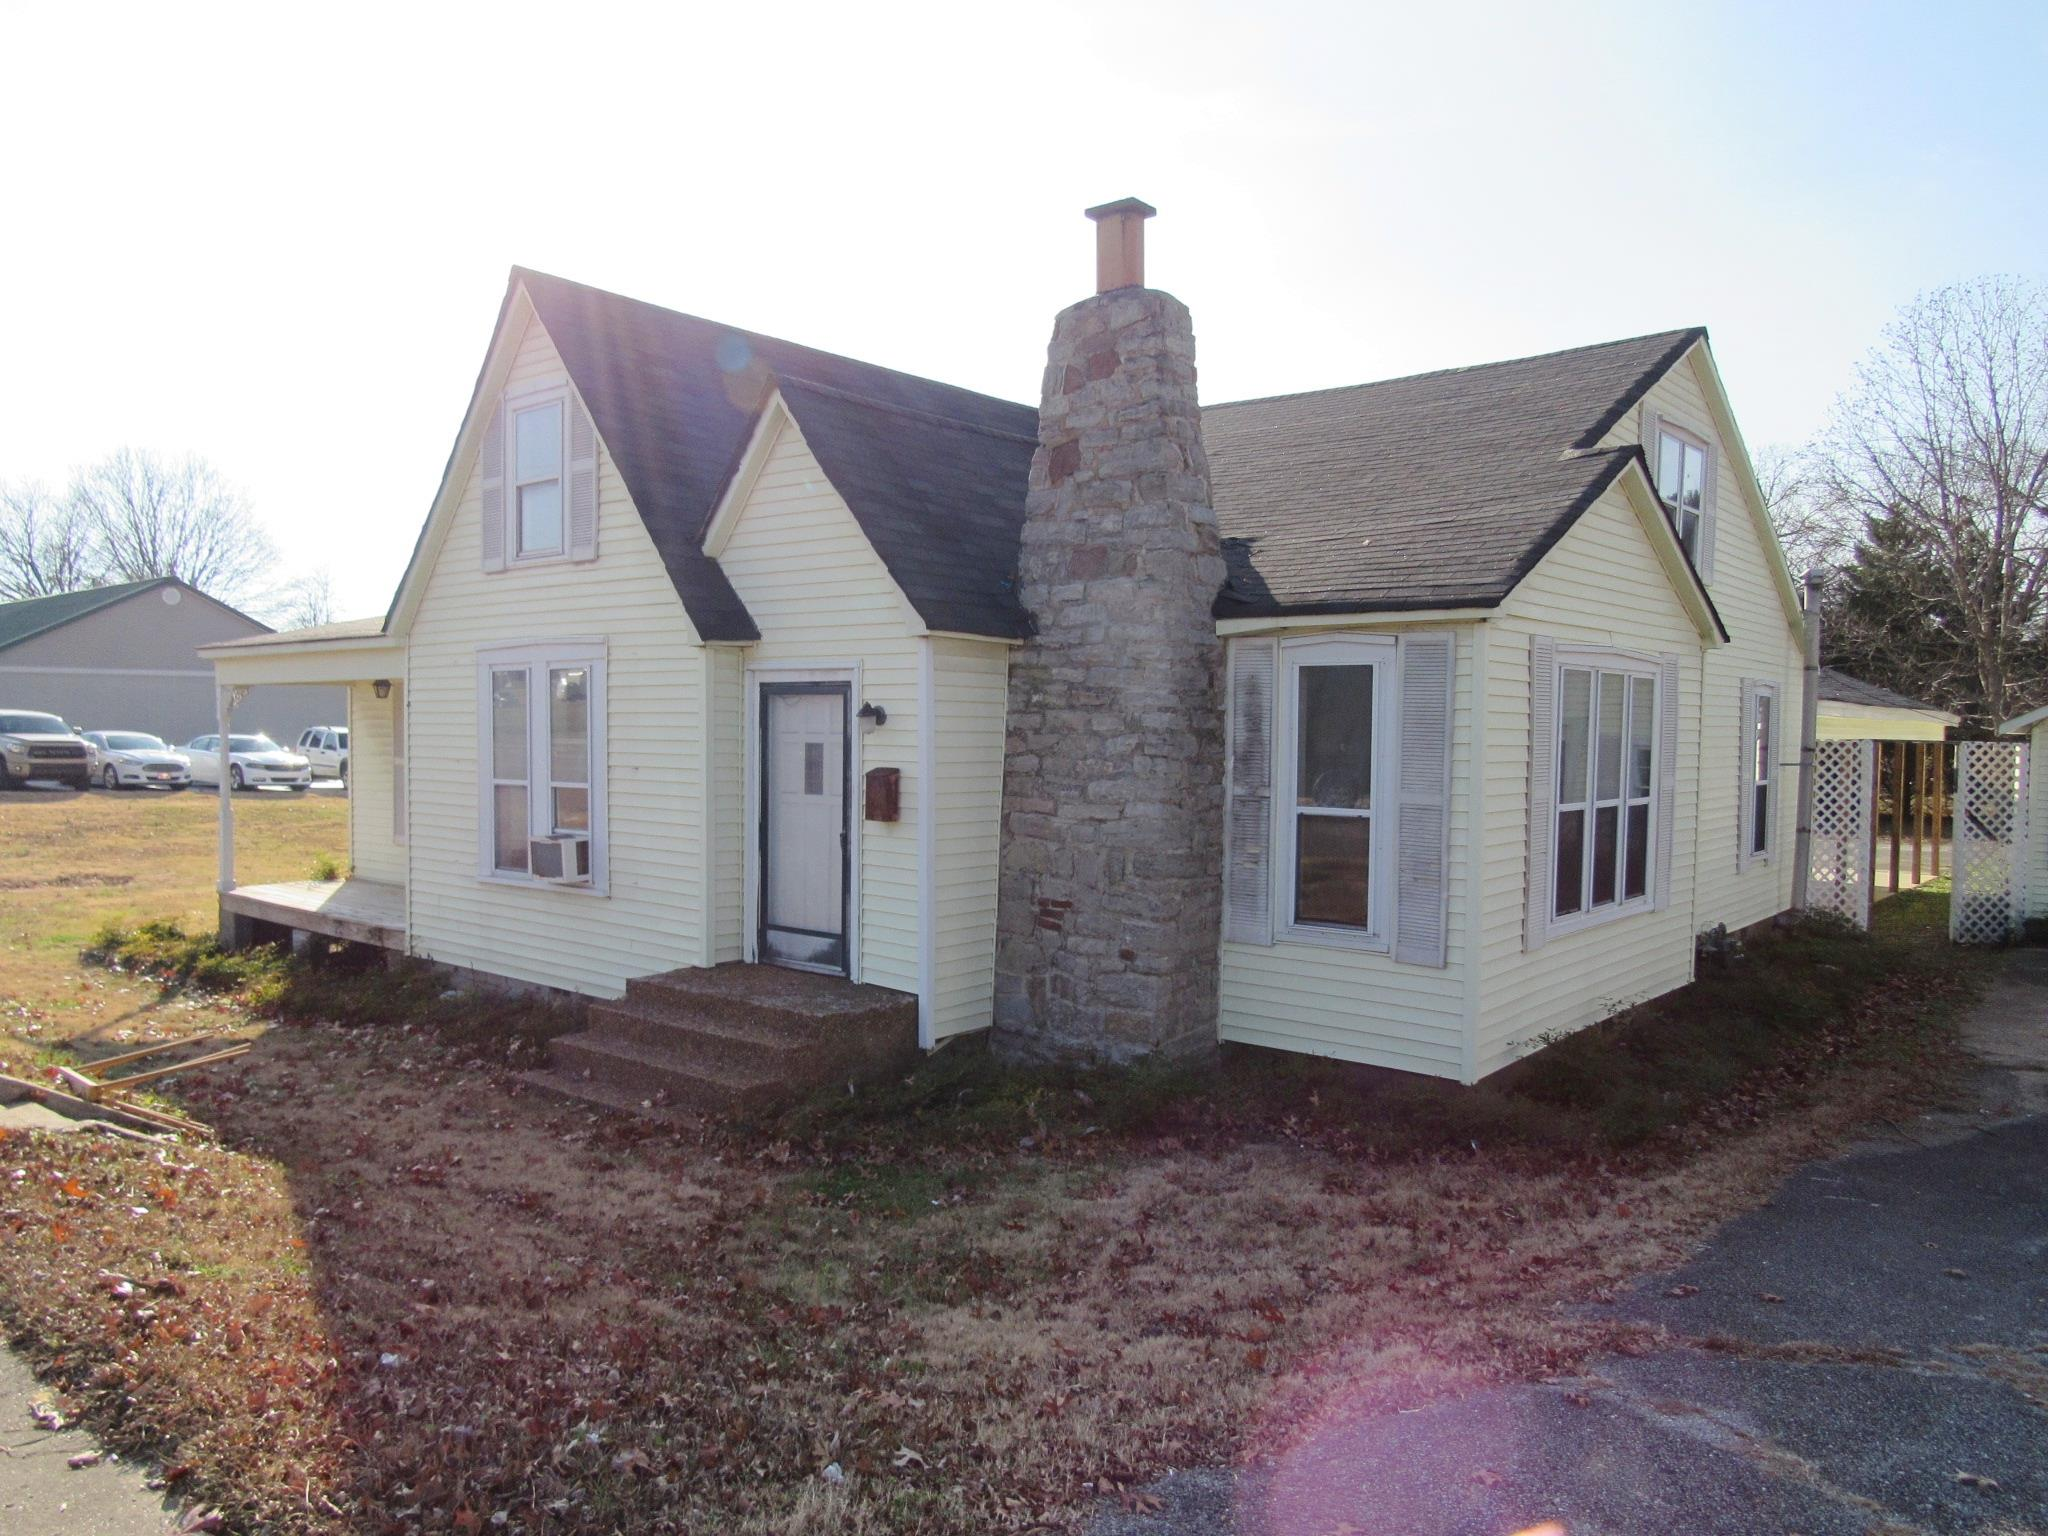 233 Tn Ave N, Parsons, TN 38363 - Parsons, TN real estate listing